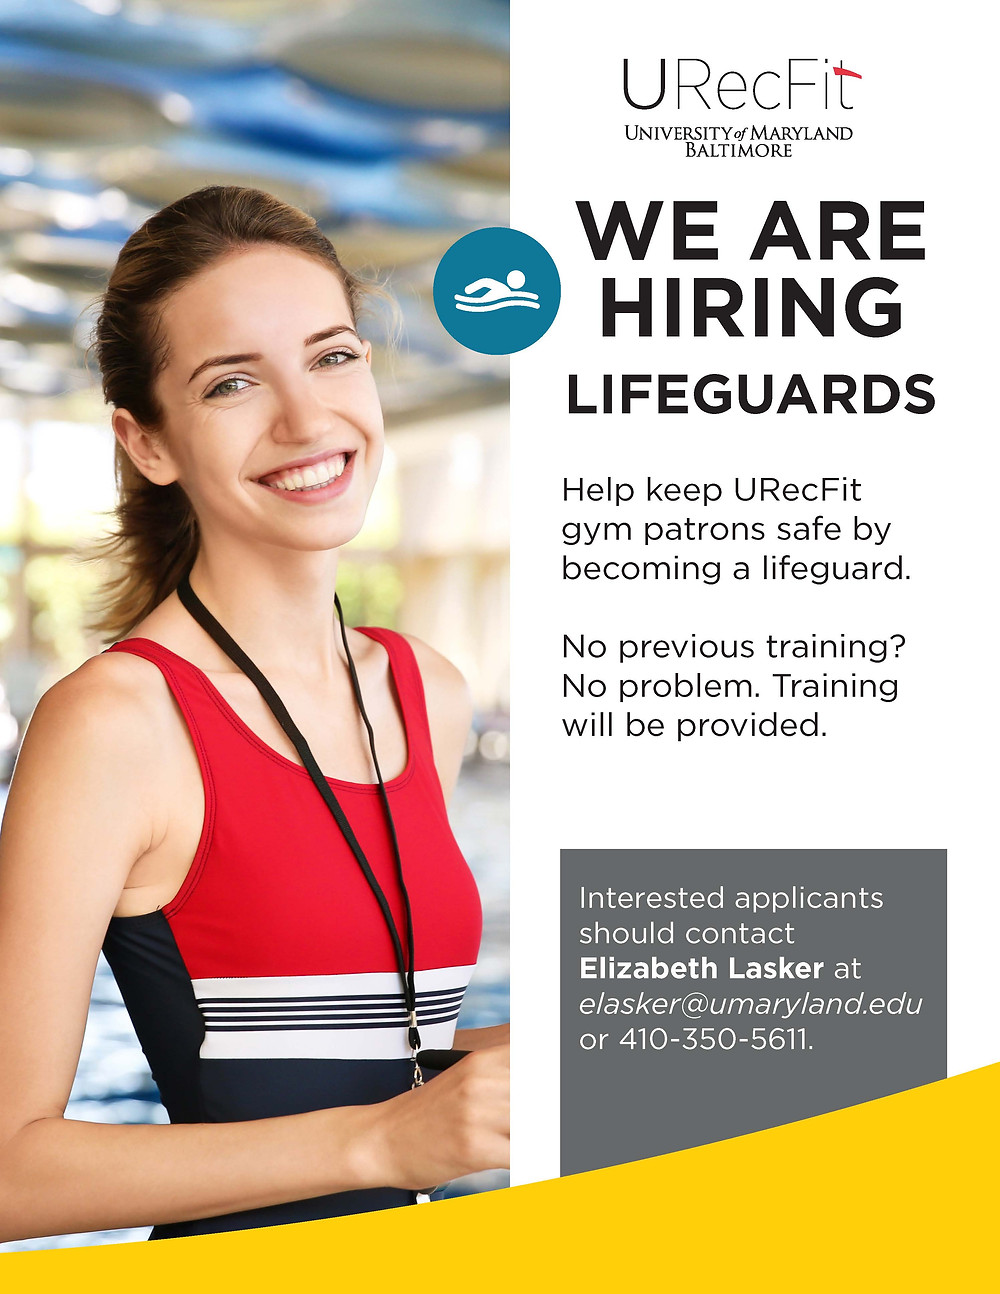 urecfit lifeguards needed